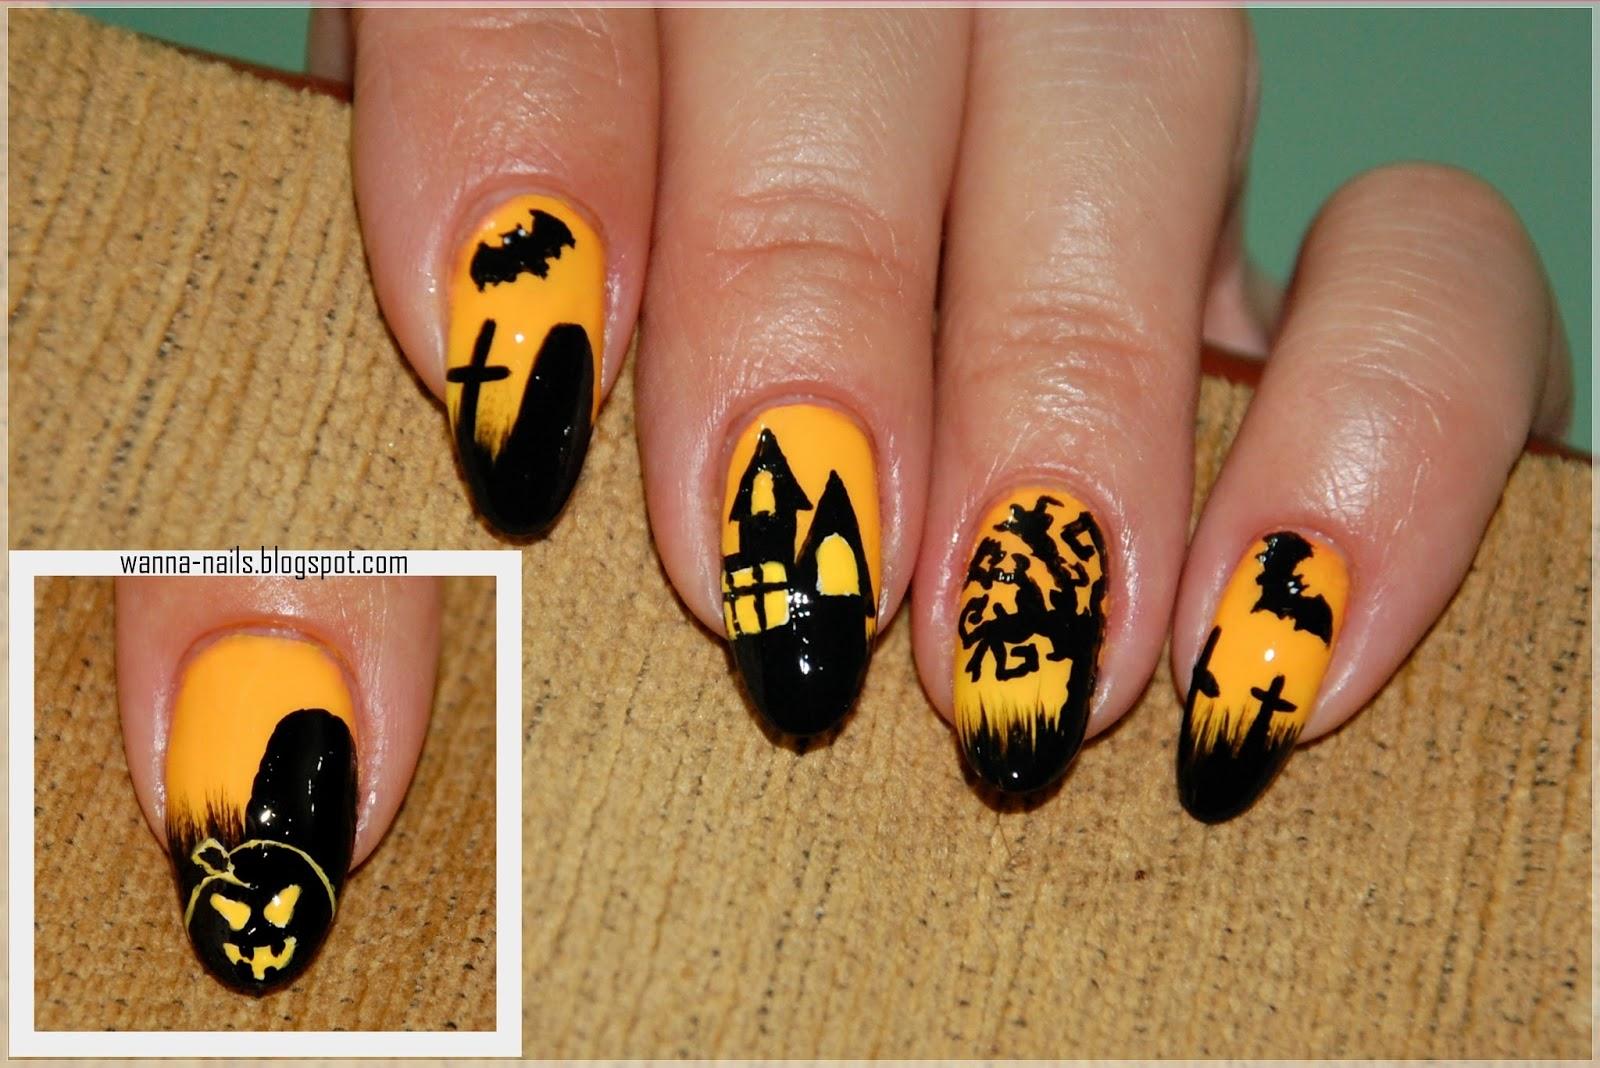 http://wanna-nails.blogspot.ro/2013/10/halloween.html